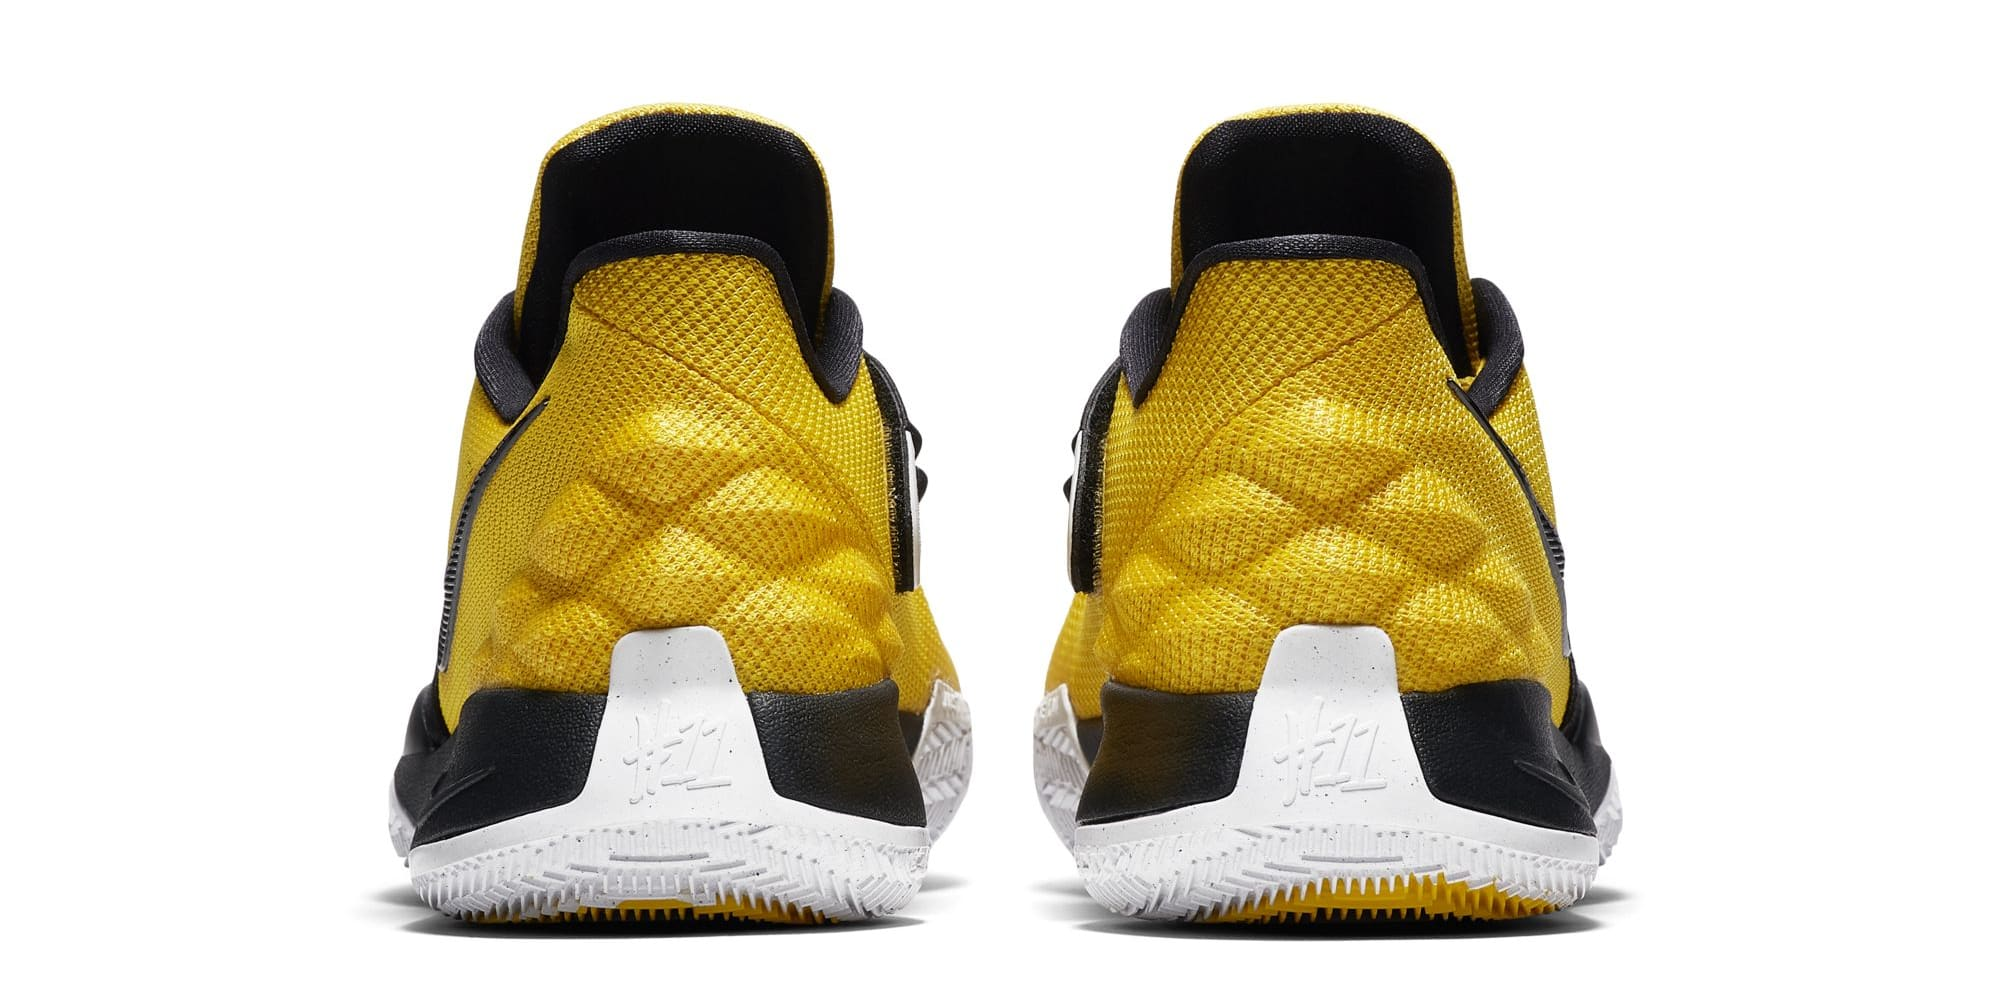 Nike Kyrie Low 'Amarillo/Black' (Heel)